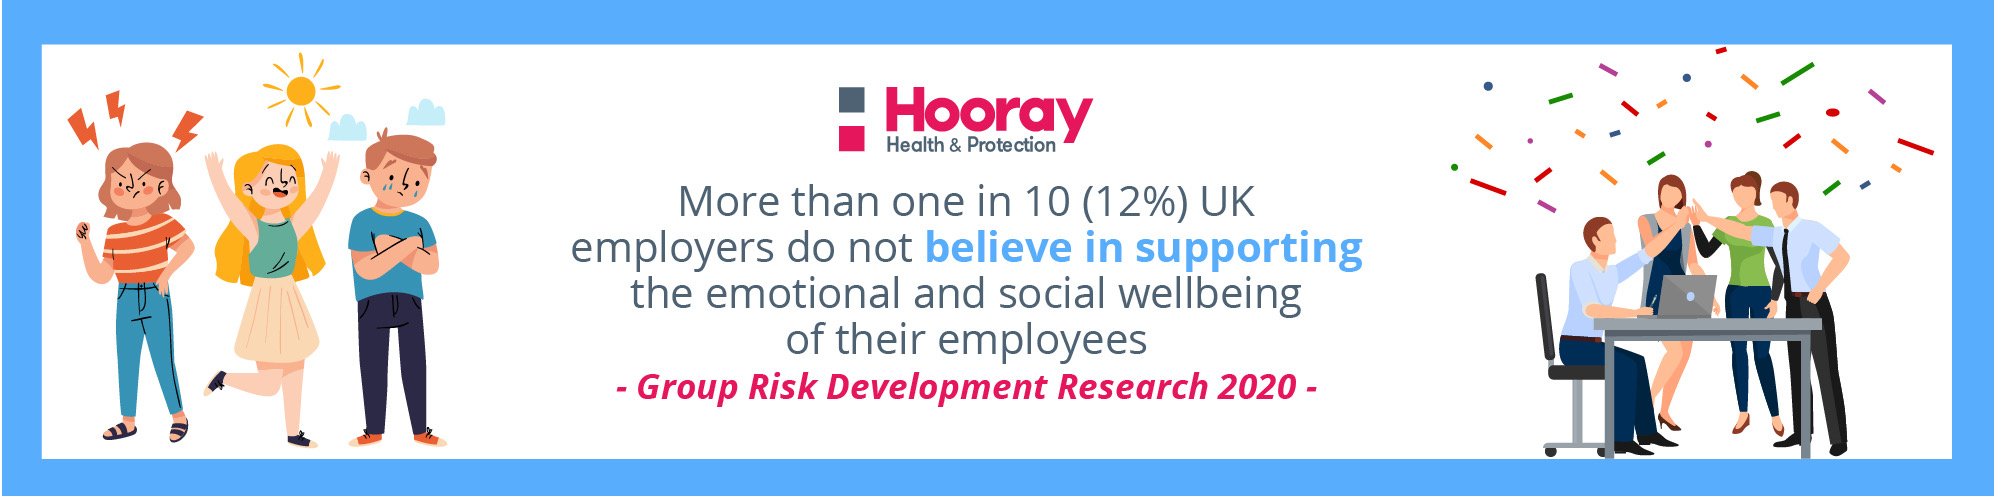 Employee Life Insurance Social Wellbeing